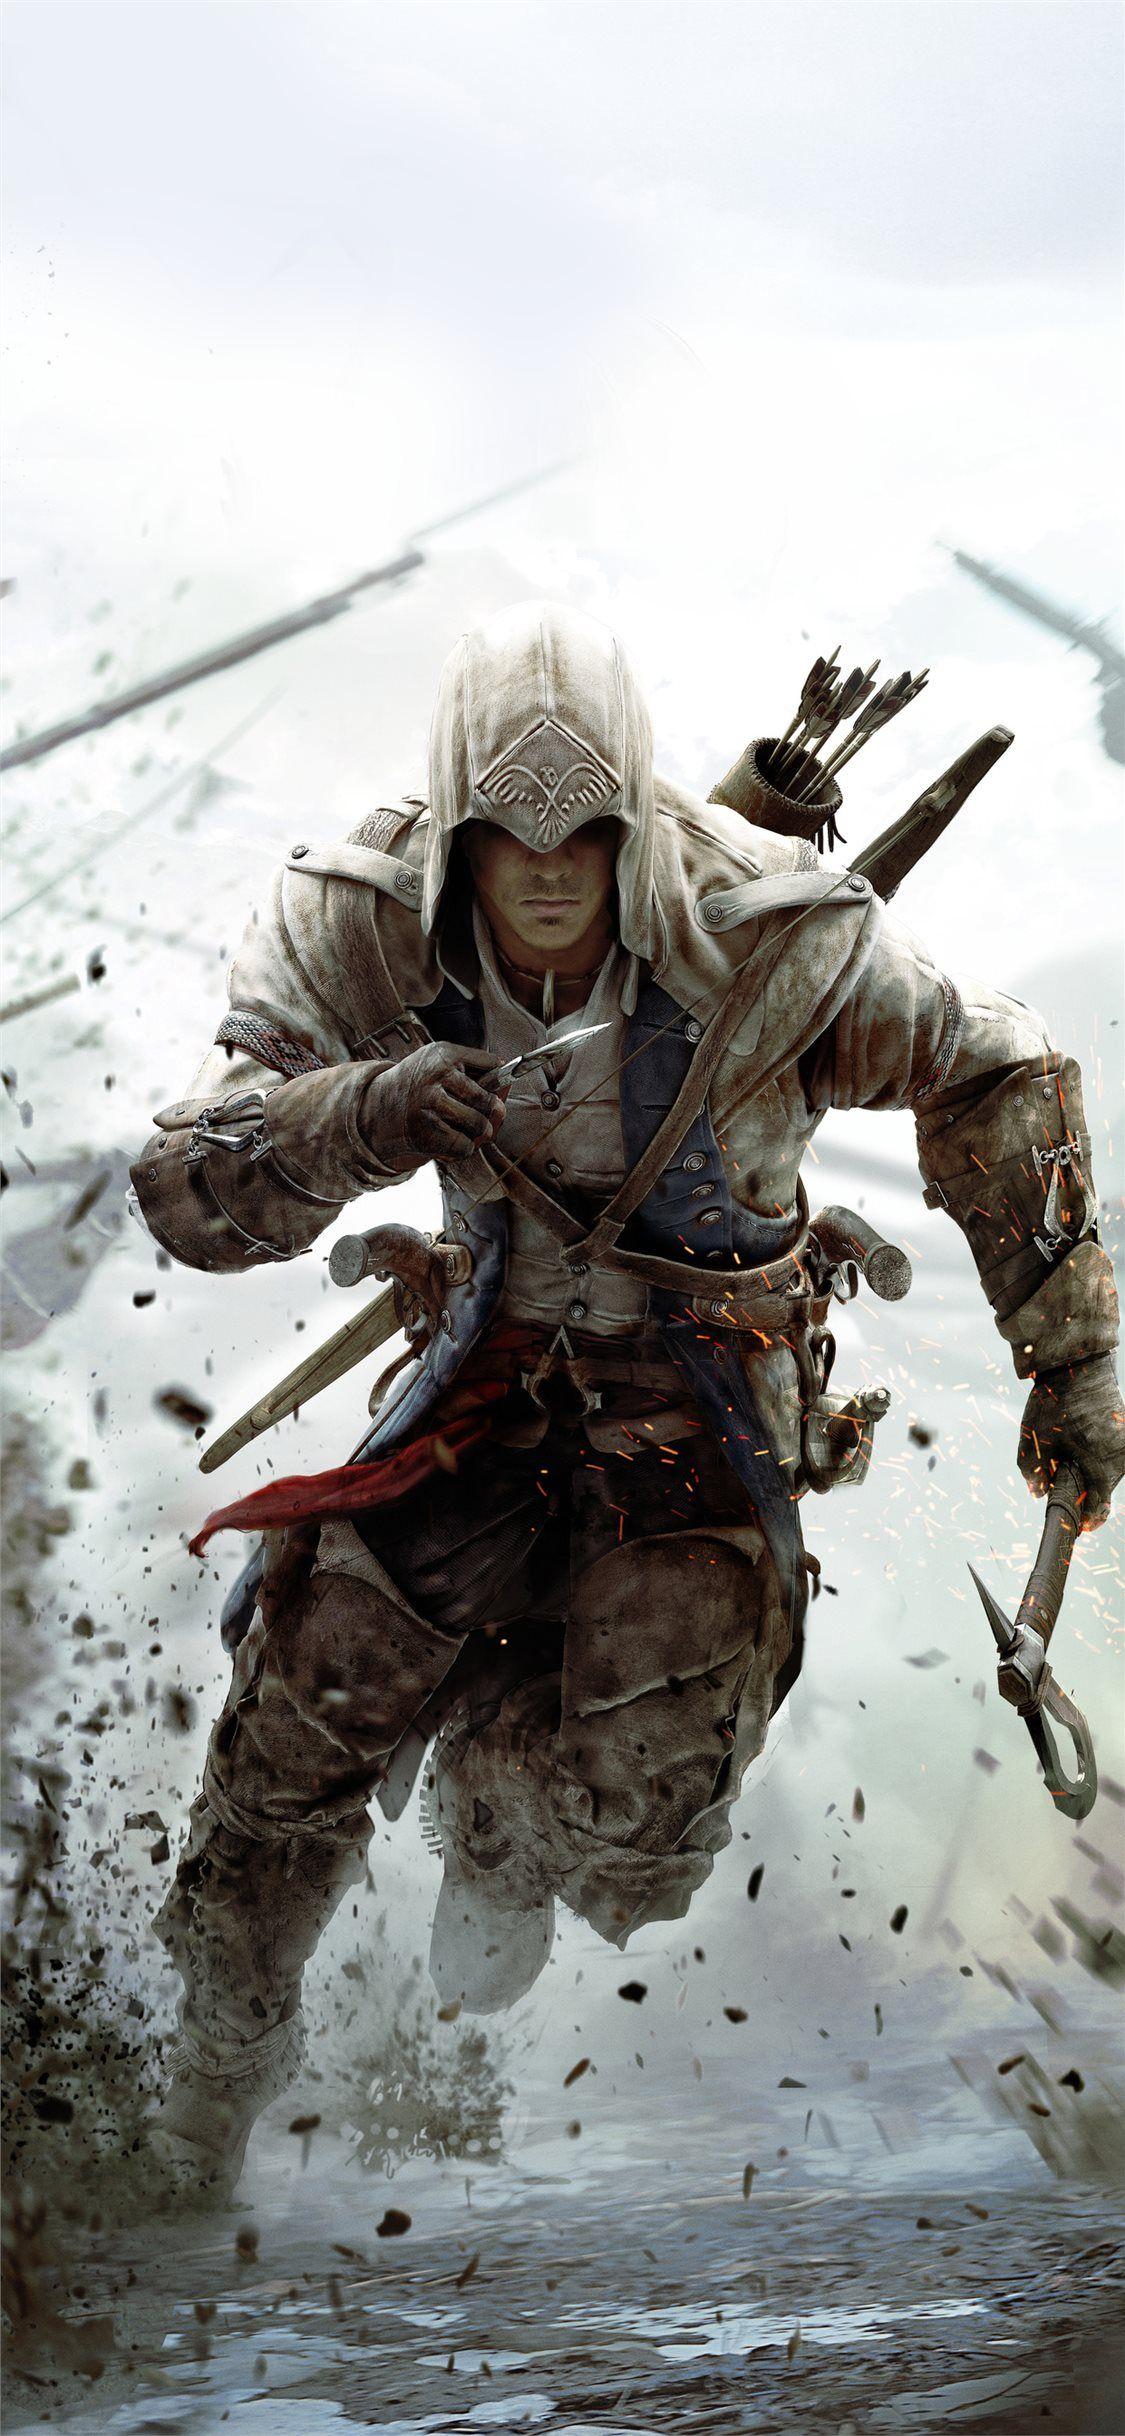 Assassins Creed 3 10k Assassin S Creed Assassin S Creed Wallpaper Assassins Creed 3